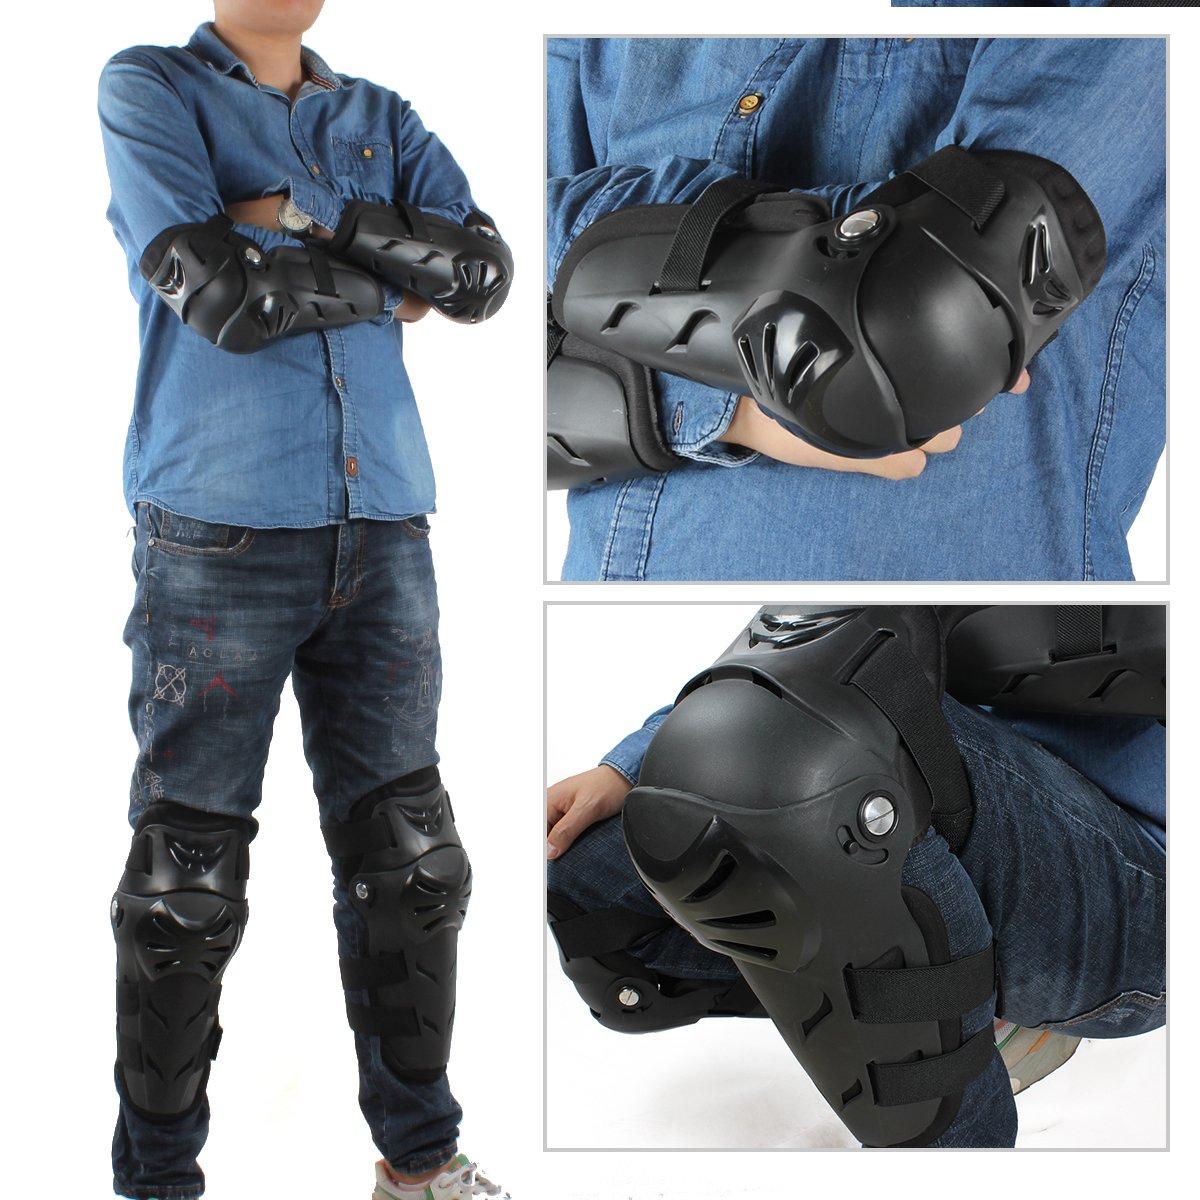 GES 4 Motorrad Knie- Ellenbogen Protektor Motocross Racing Knee Guard Schienbeinschoner schutzausr/üstungen f/ür Erwachsene Schwarz